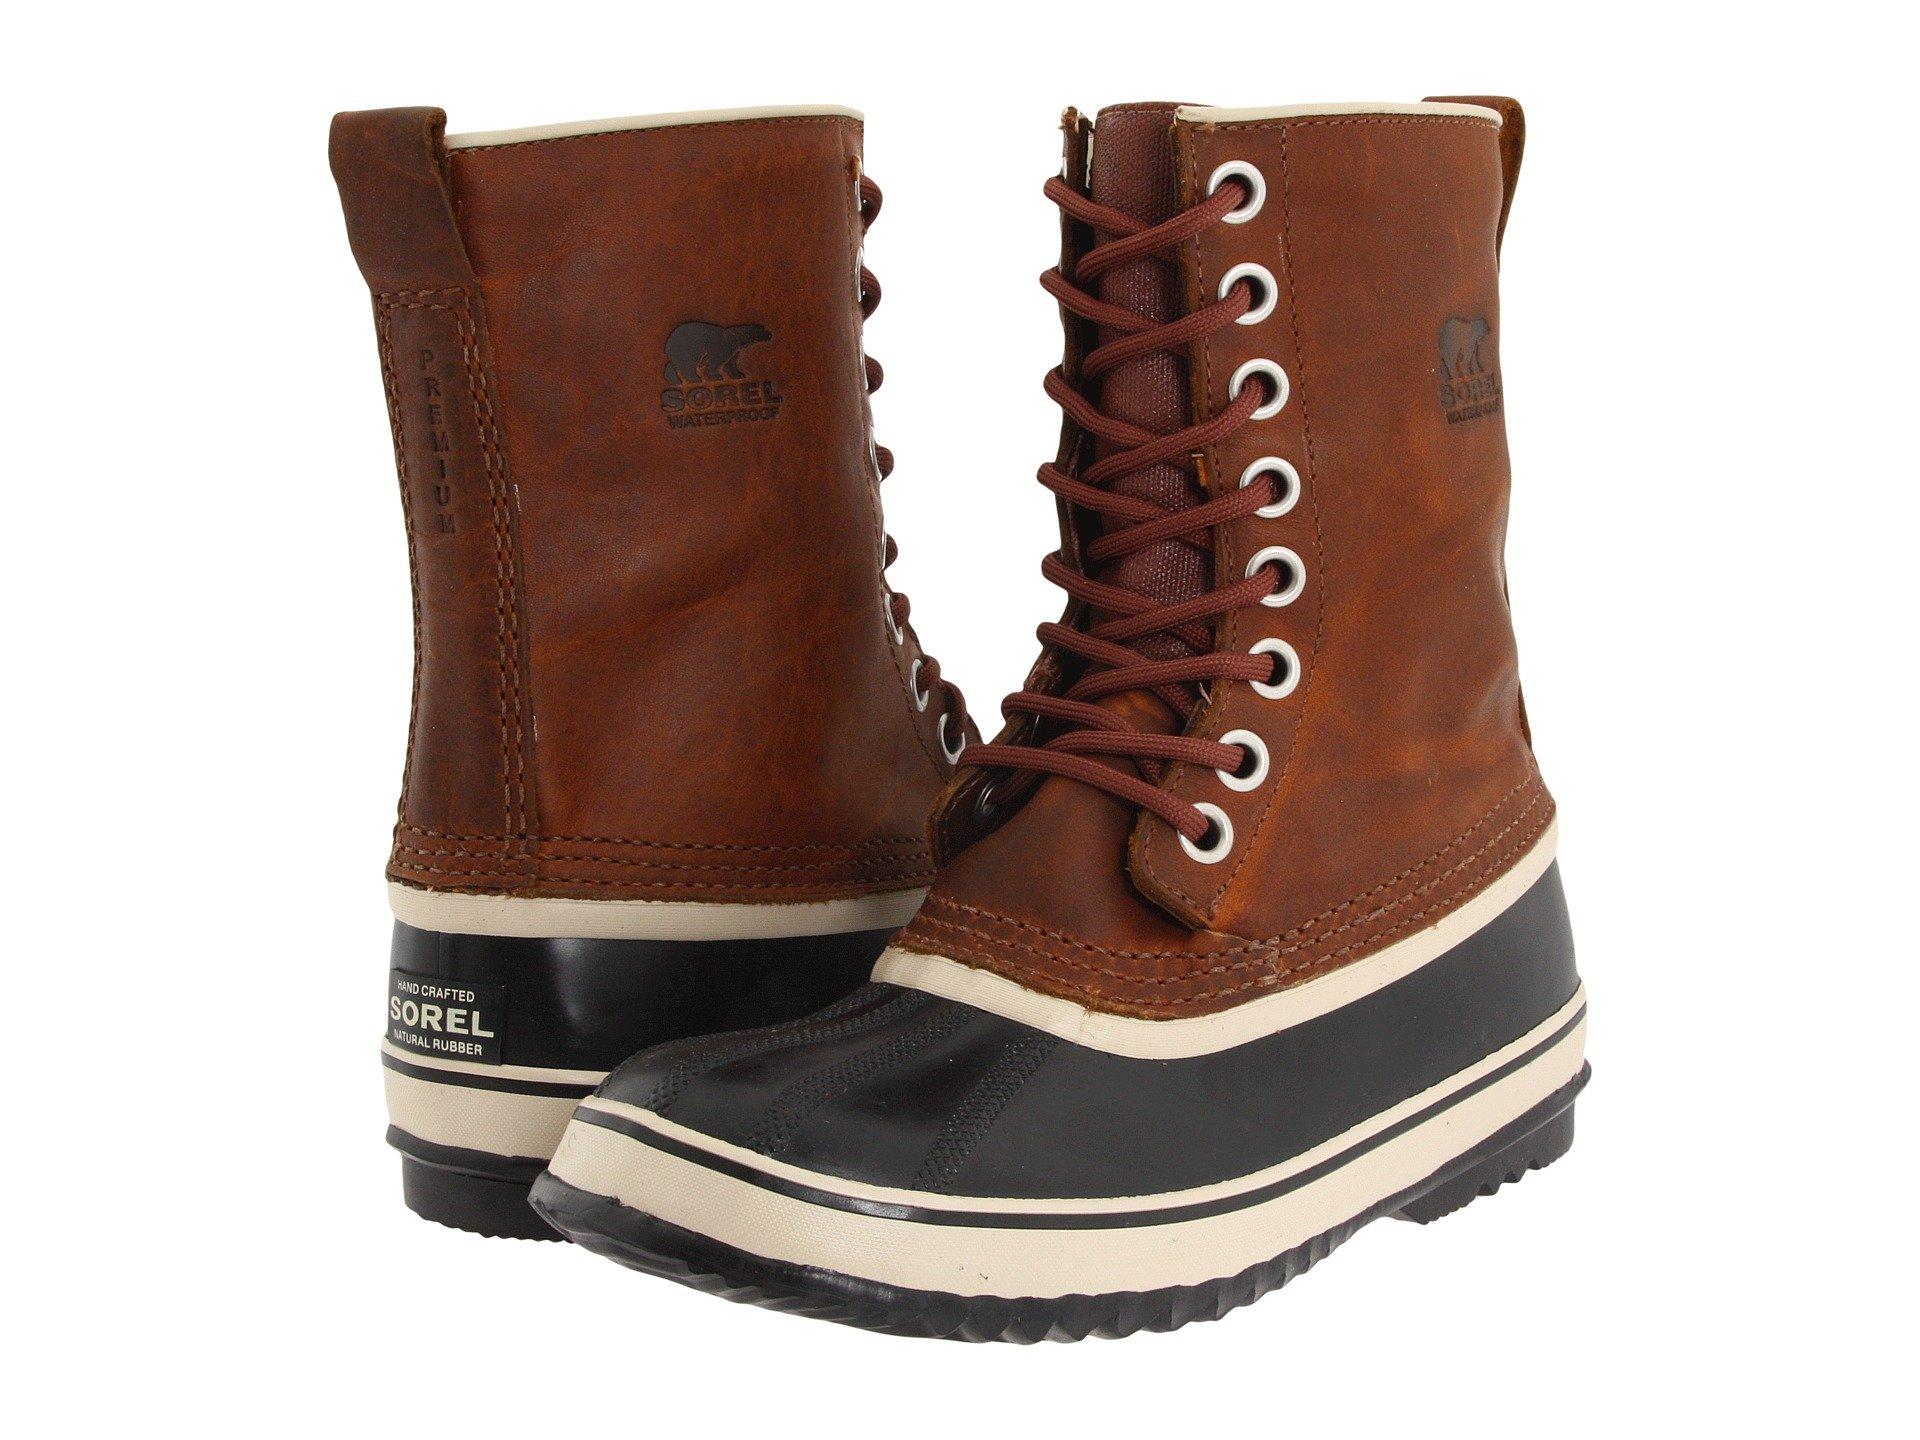 cbdaa12a2d0 Women s SOREL Boots + FREE SHIPPING